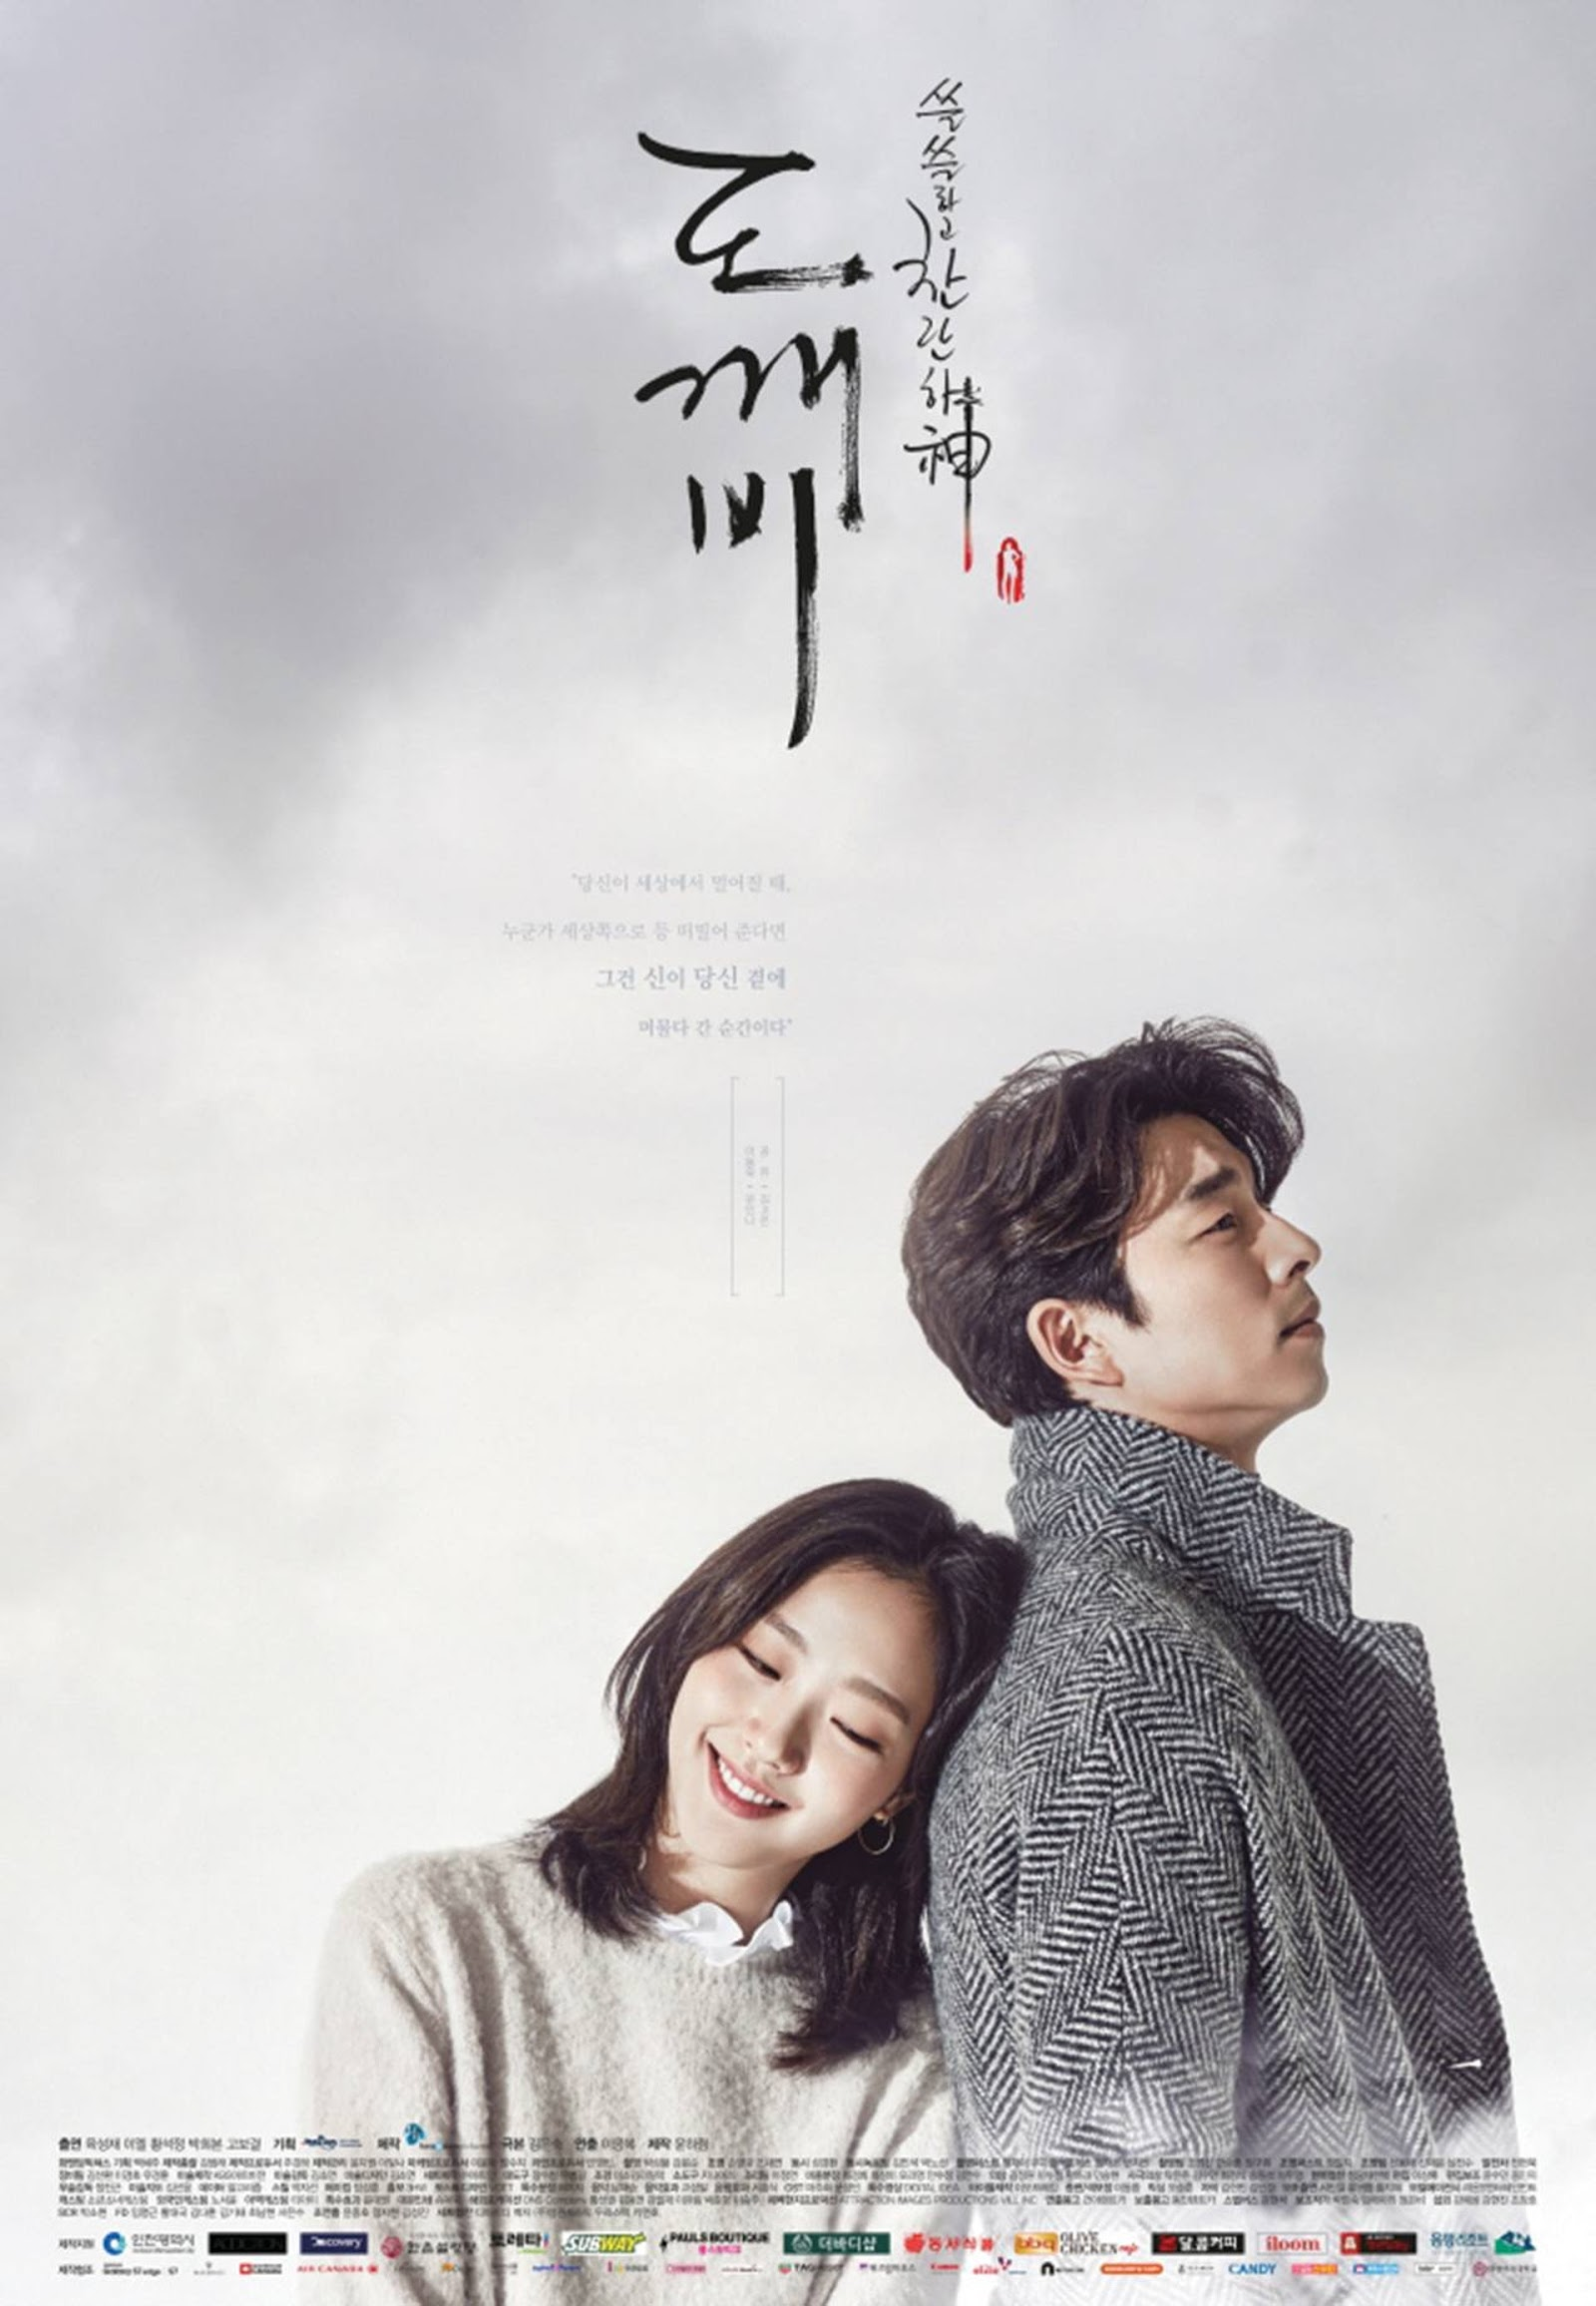 Gong Yoo Reveals He Wants To Star In Season 2 Of